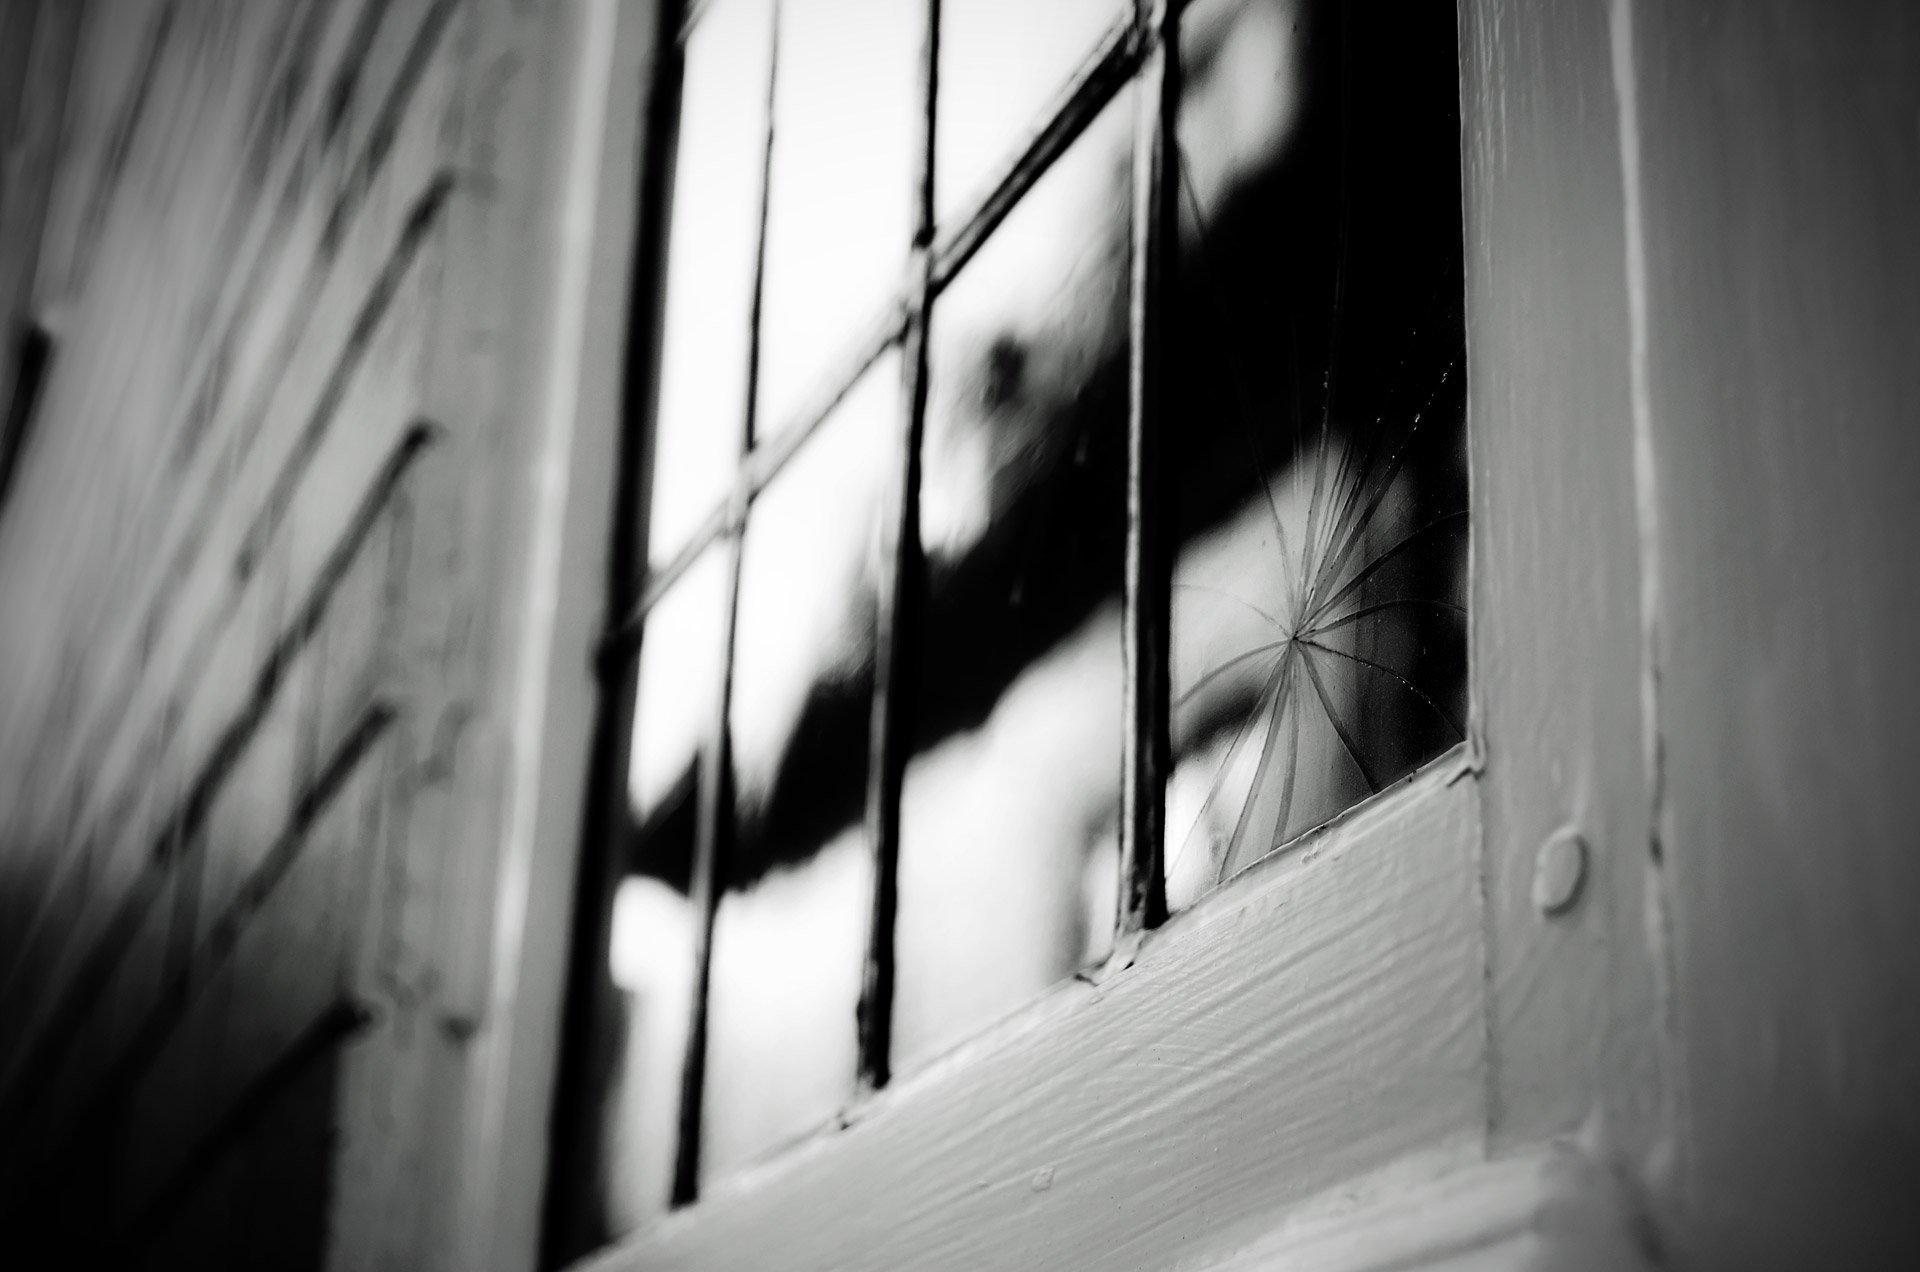 rotura vidrio ventana